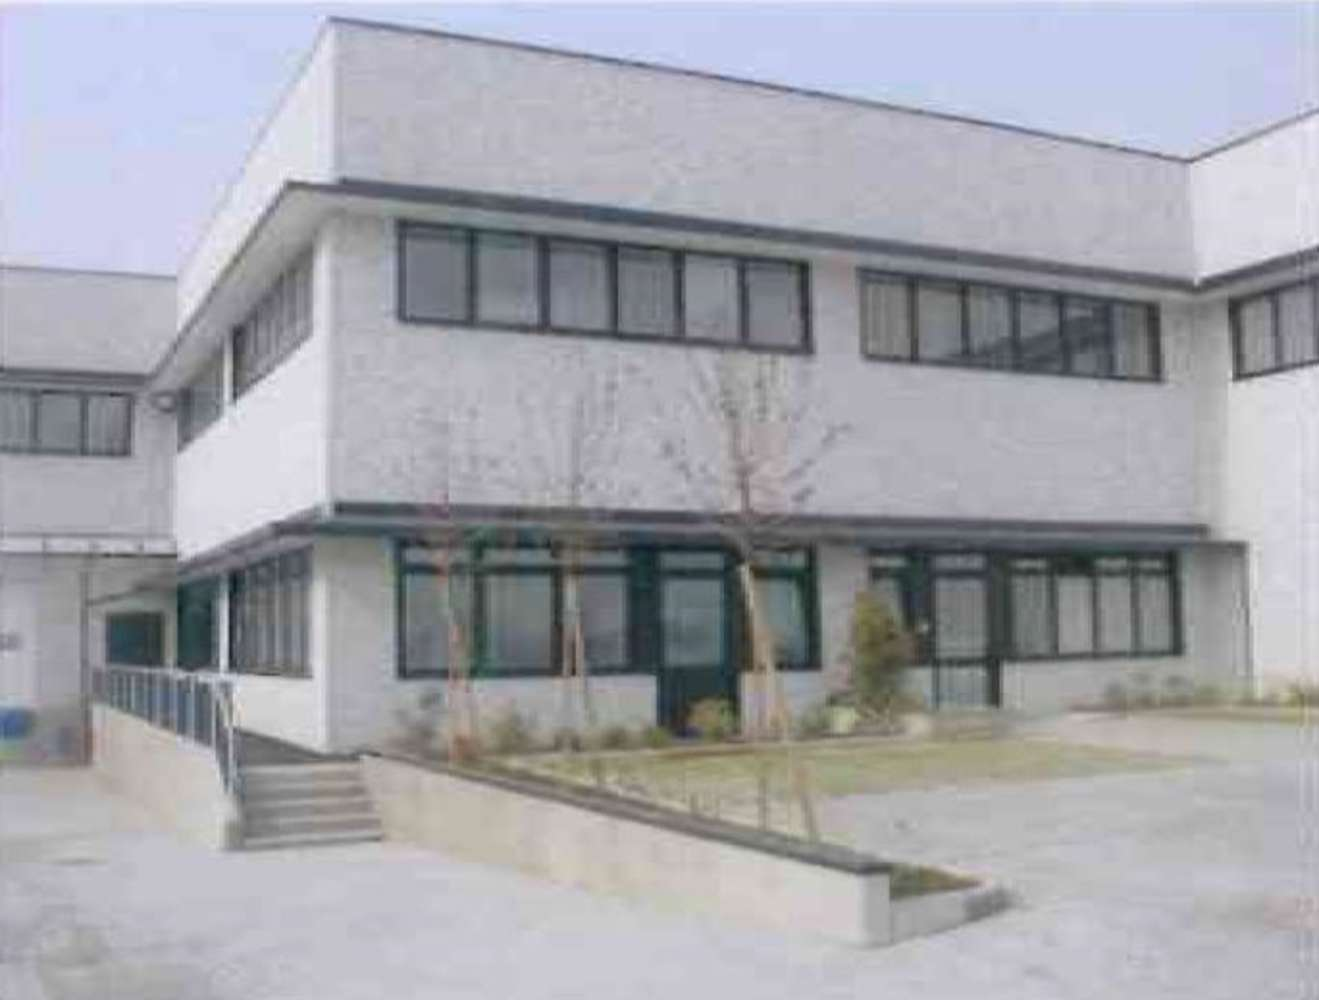 Magazzini industriali e logistici Livraga, 26814 - Livraga - 9200250